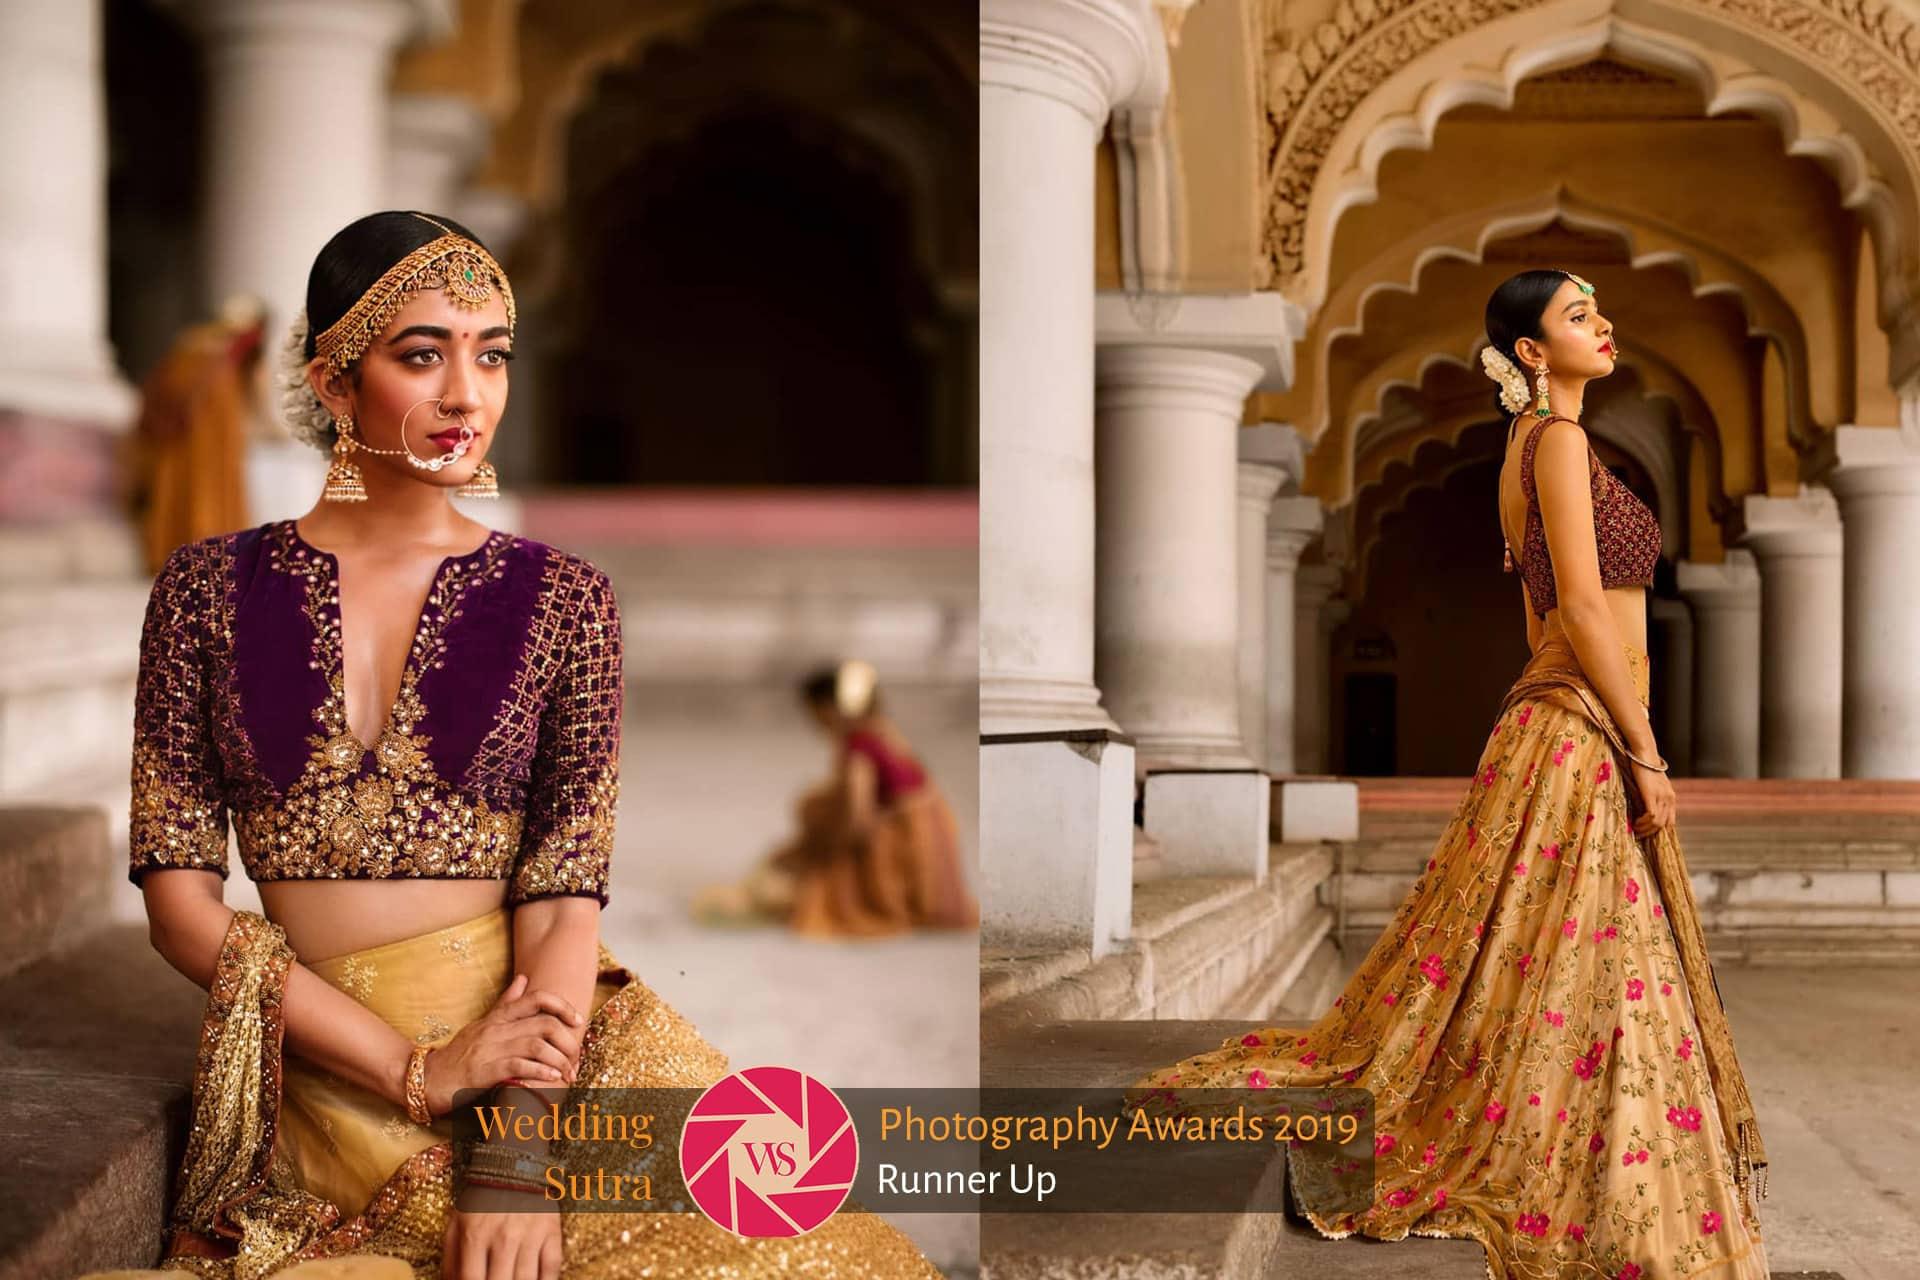 Wedding Sutra photography awards runner's up Arjun Kamth Indian Wedding Photography